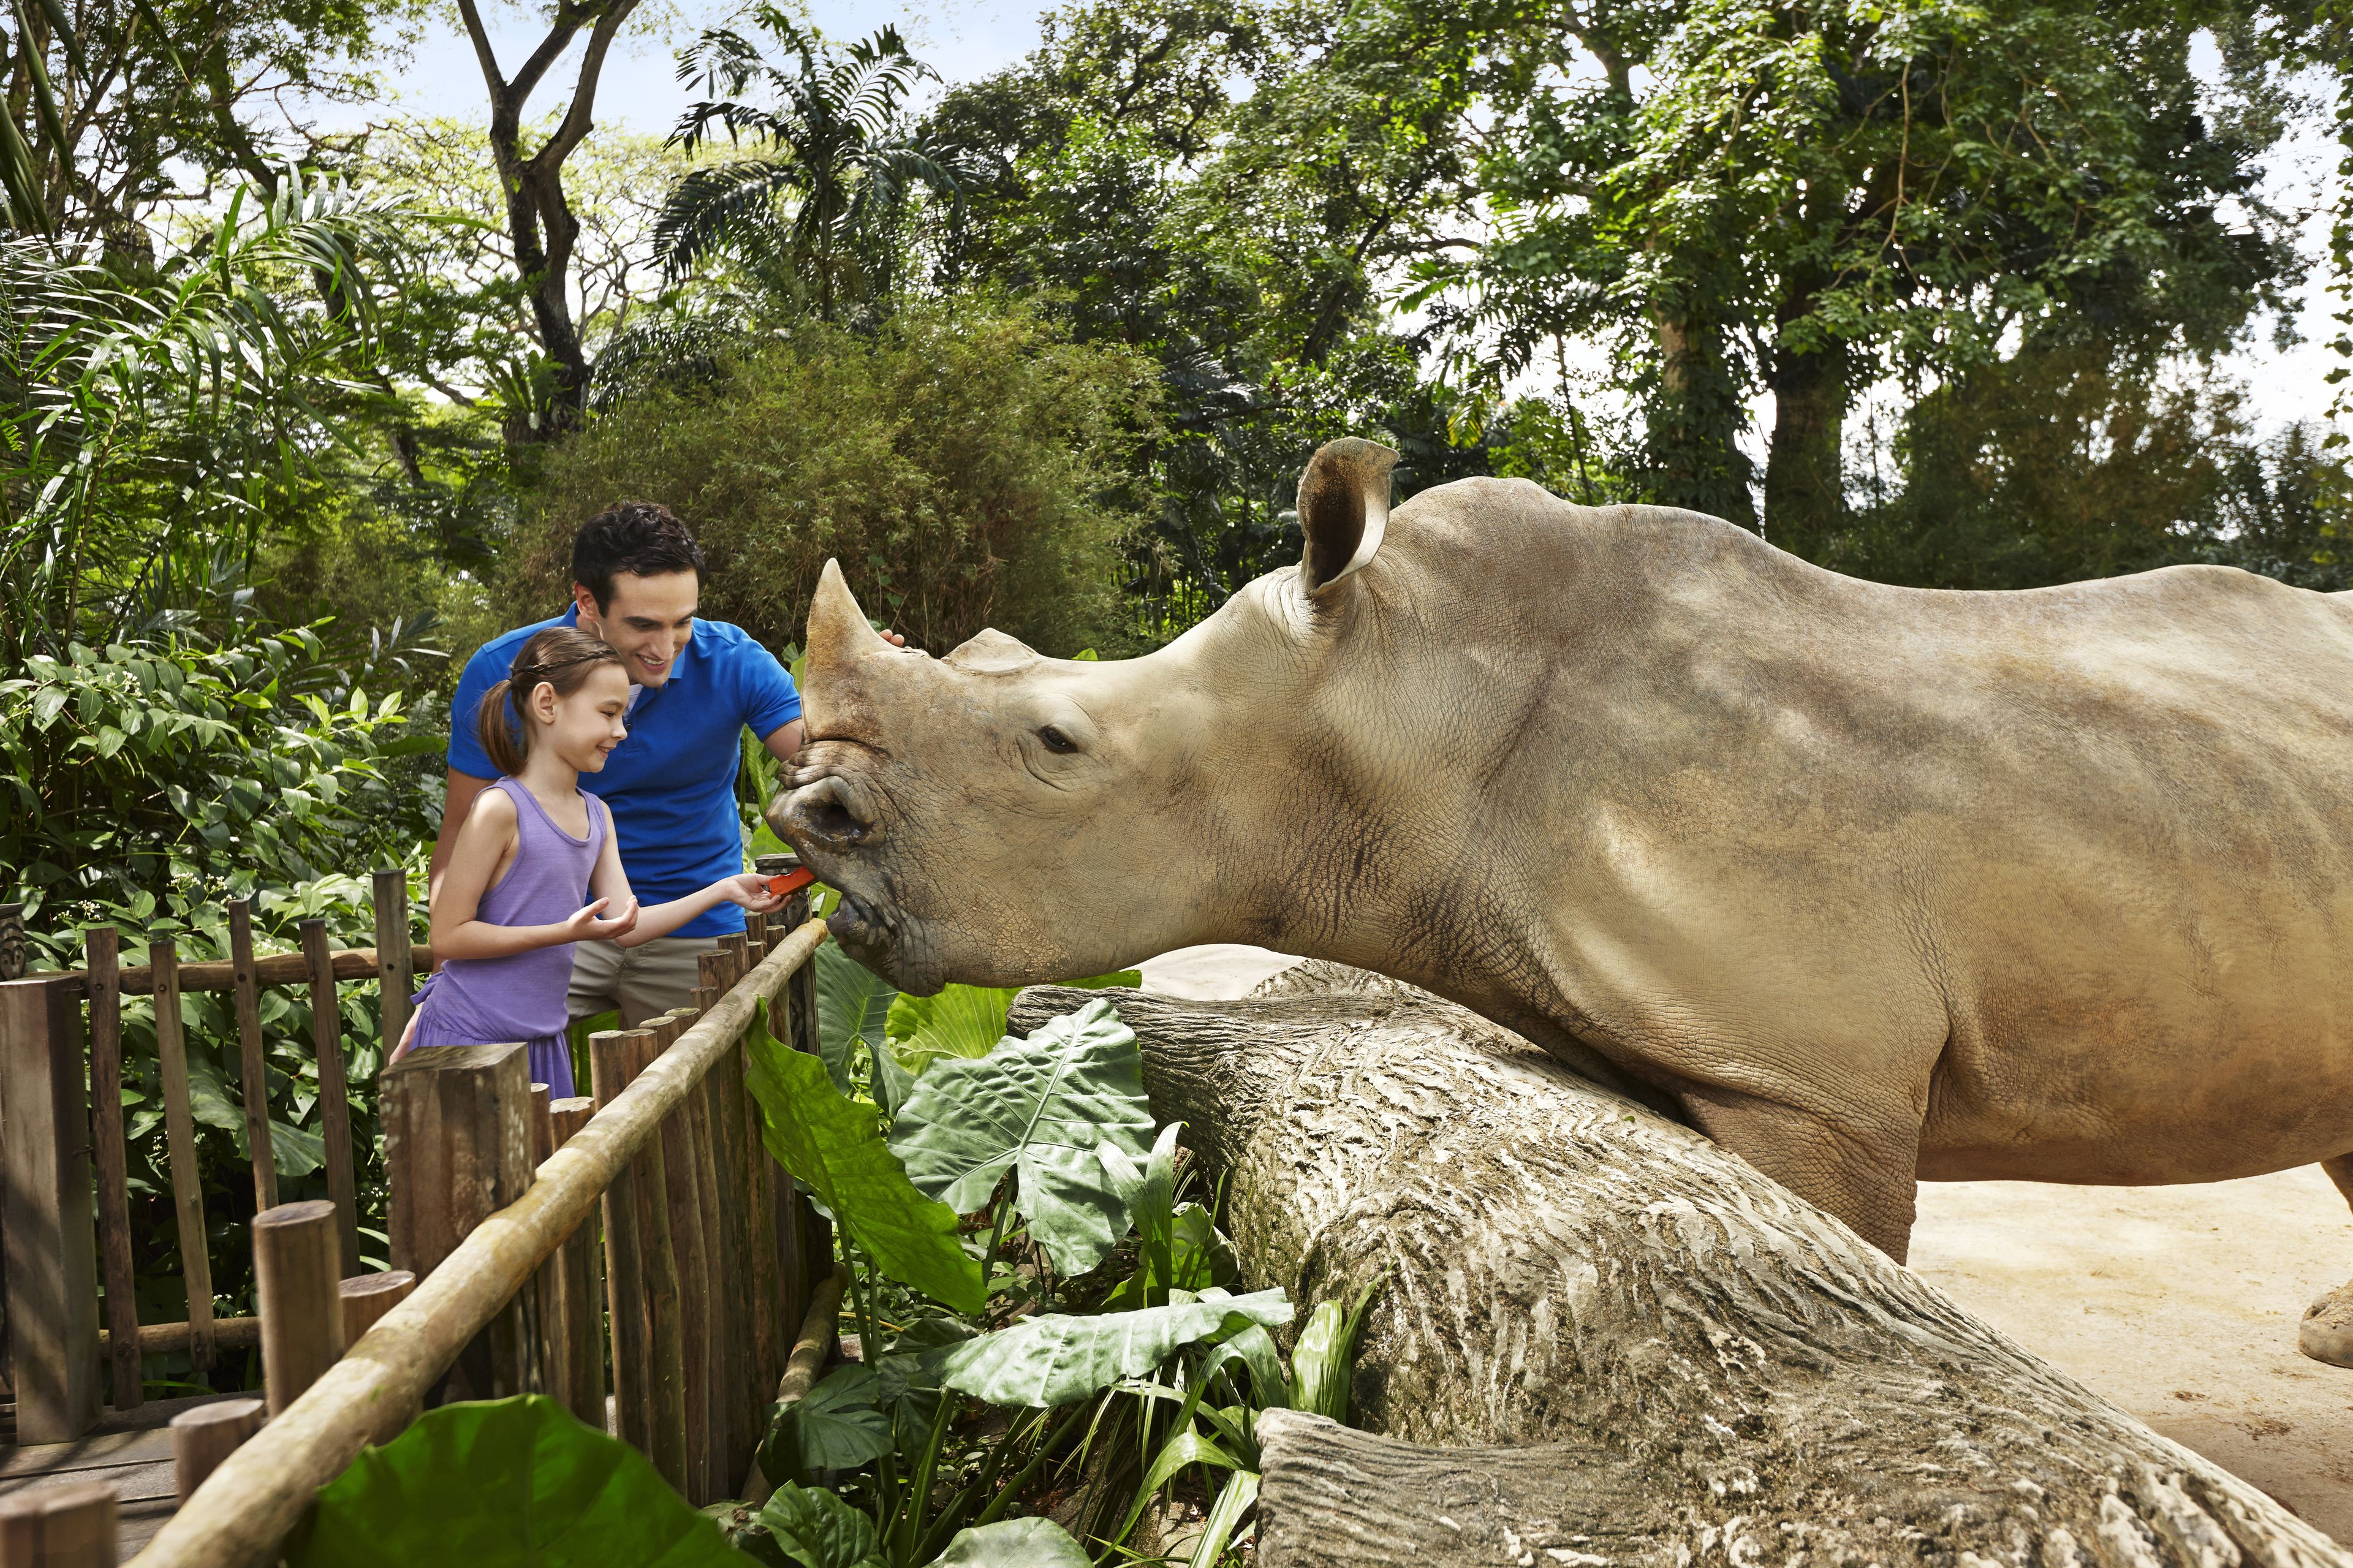 Zoo_RhinoFeeding_379_Main_04.jpg